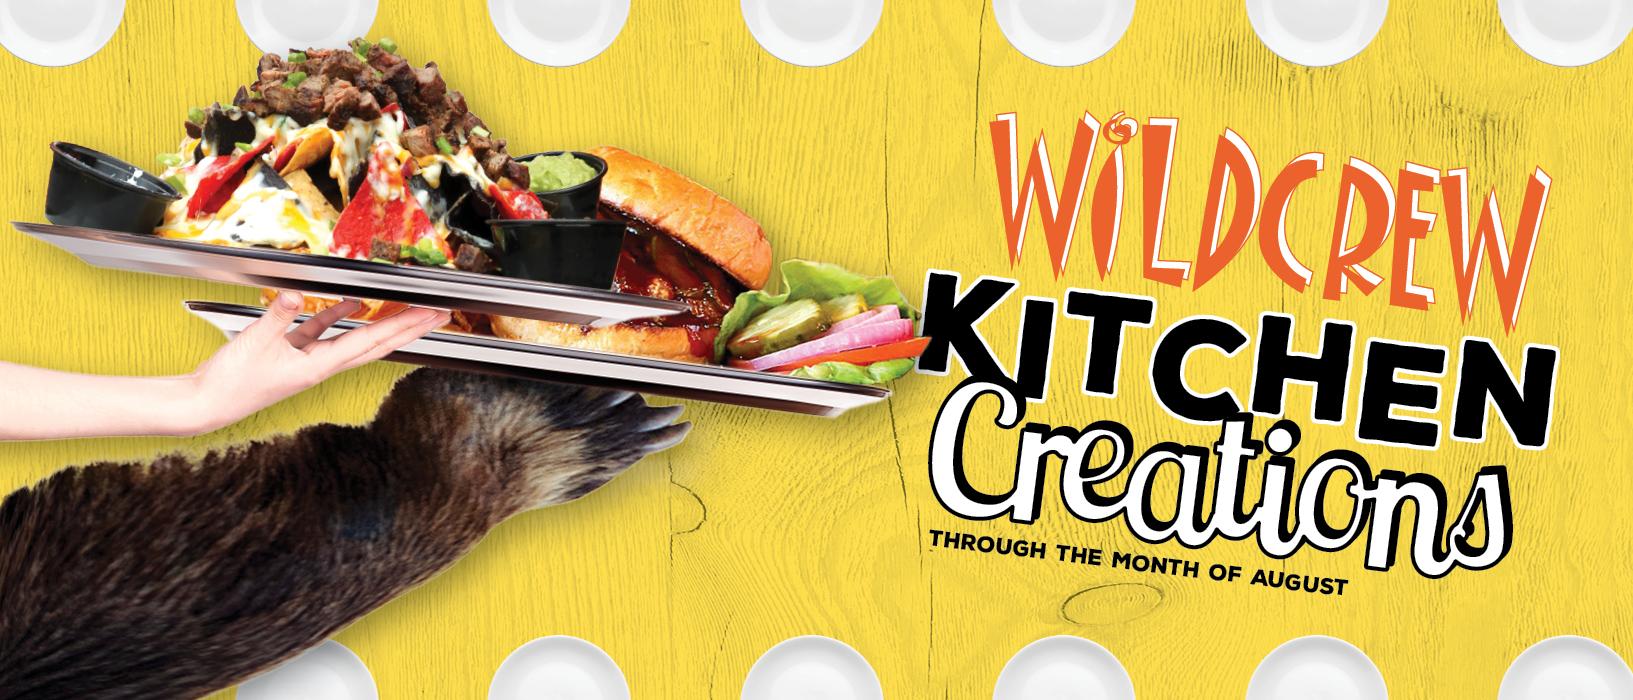 Wildcrew Kitchen Creations